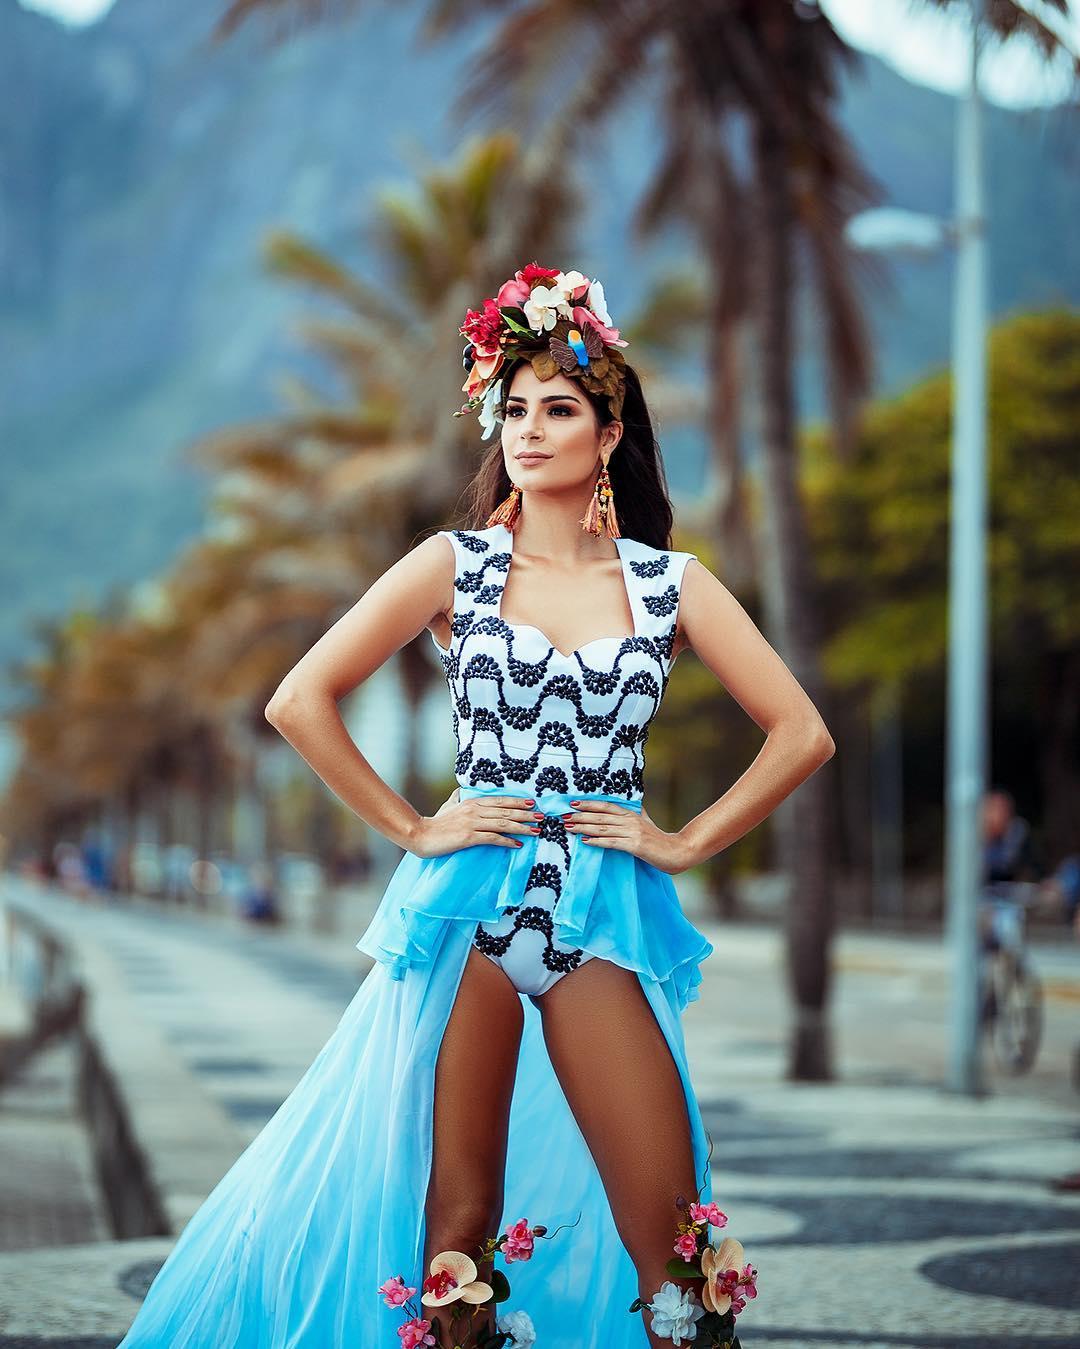 julia horta, miss brasil universo 2019/top 2 de reynado internacional cafe 2016, top 5 de miss tourism international 2017. - Página 6 24327681_141617806491325_4100254987995578368_n